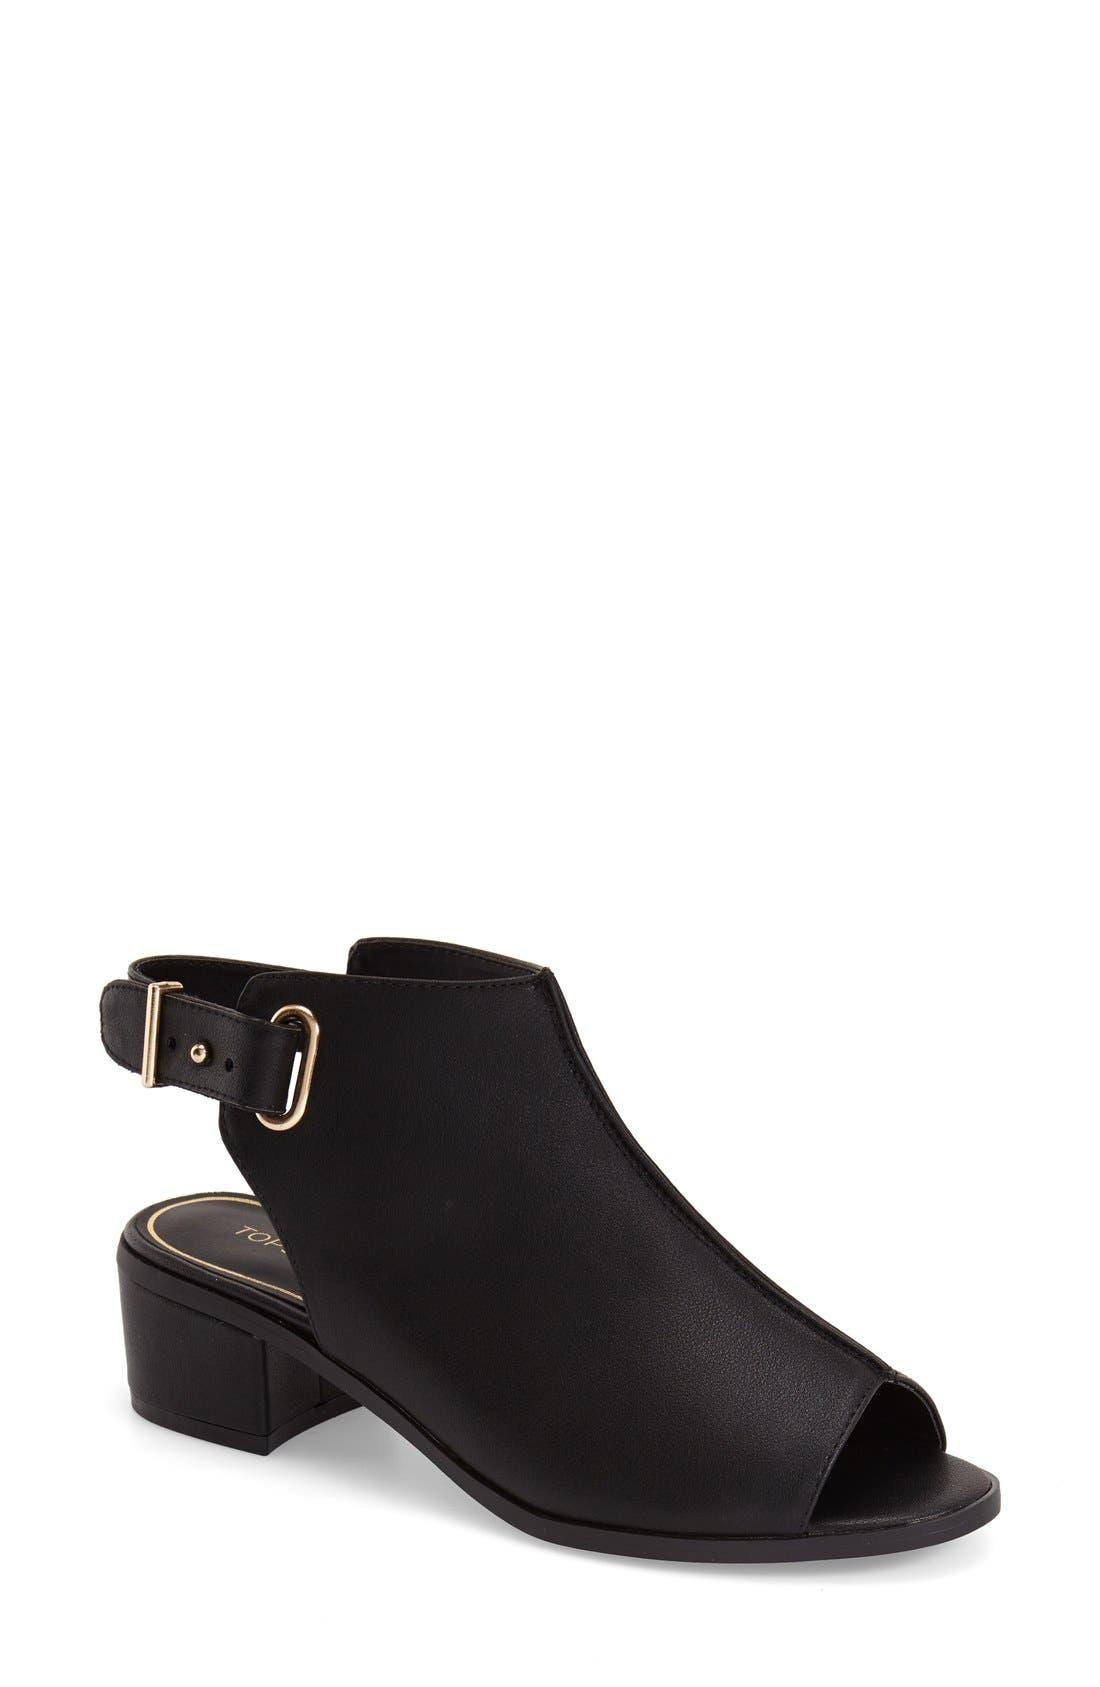 Alternate Image 1 Selected - Topshop 'Nix' Slingback Block Heel Sandal (Women)